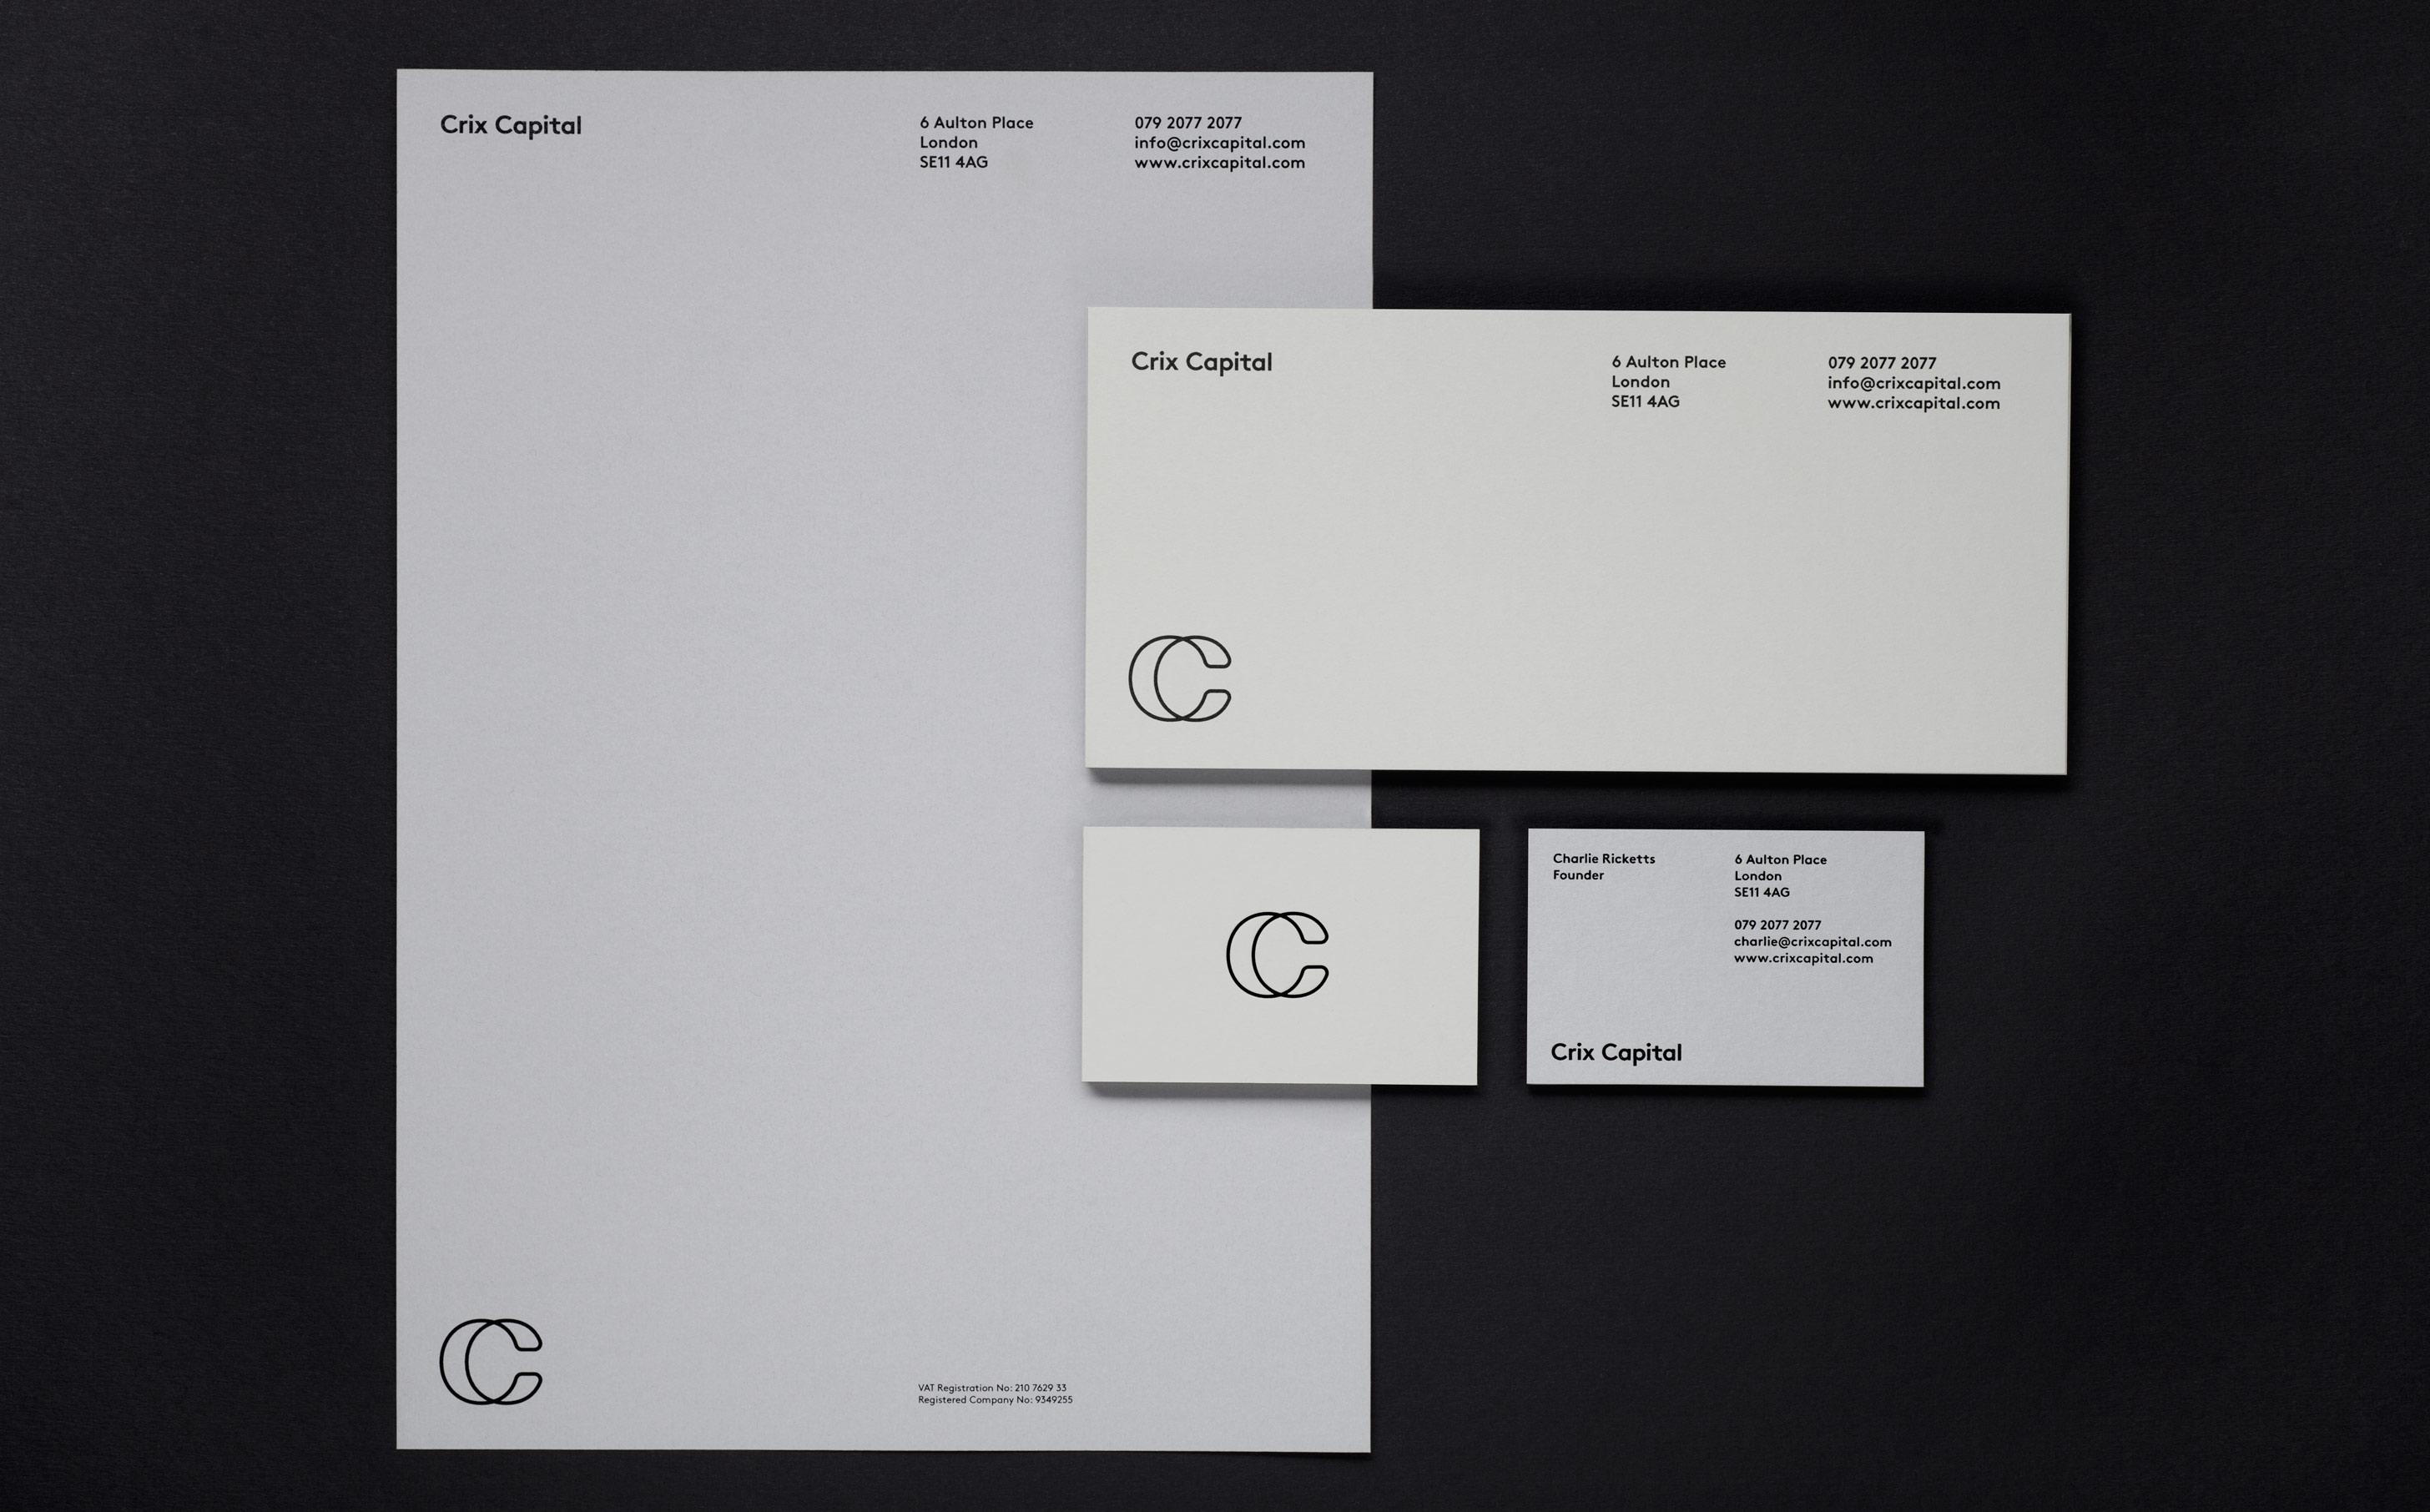 Stationary-design-crix-capital-london